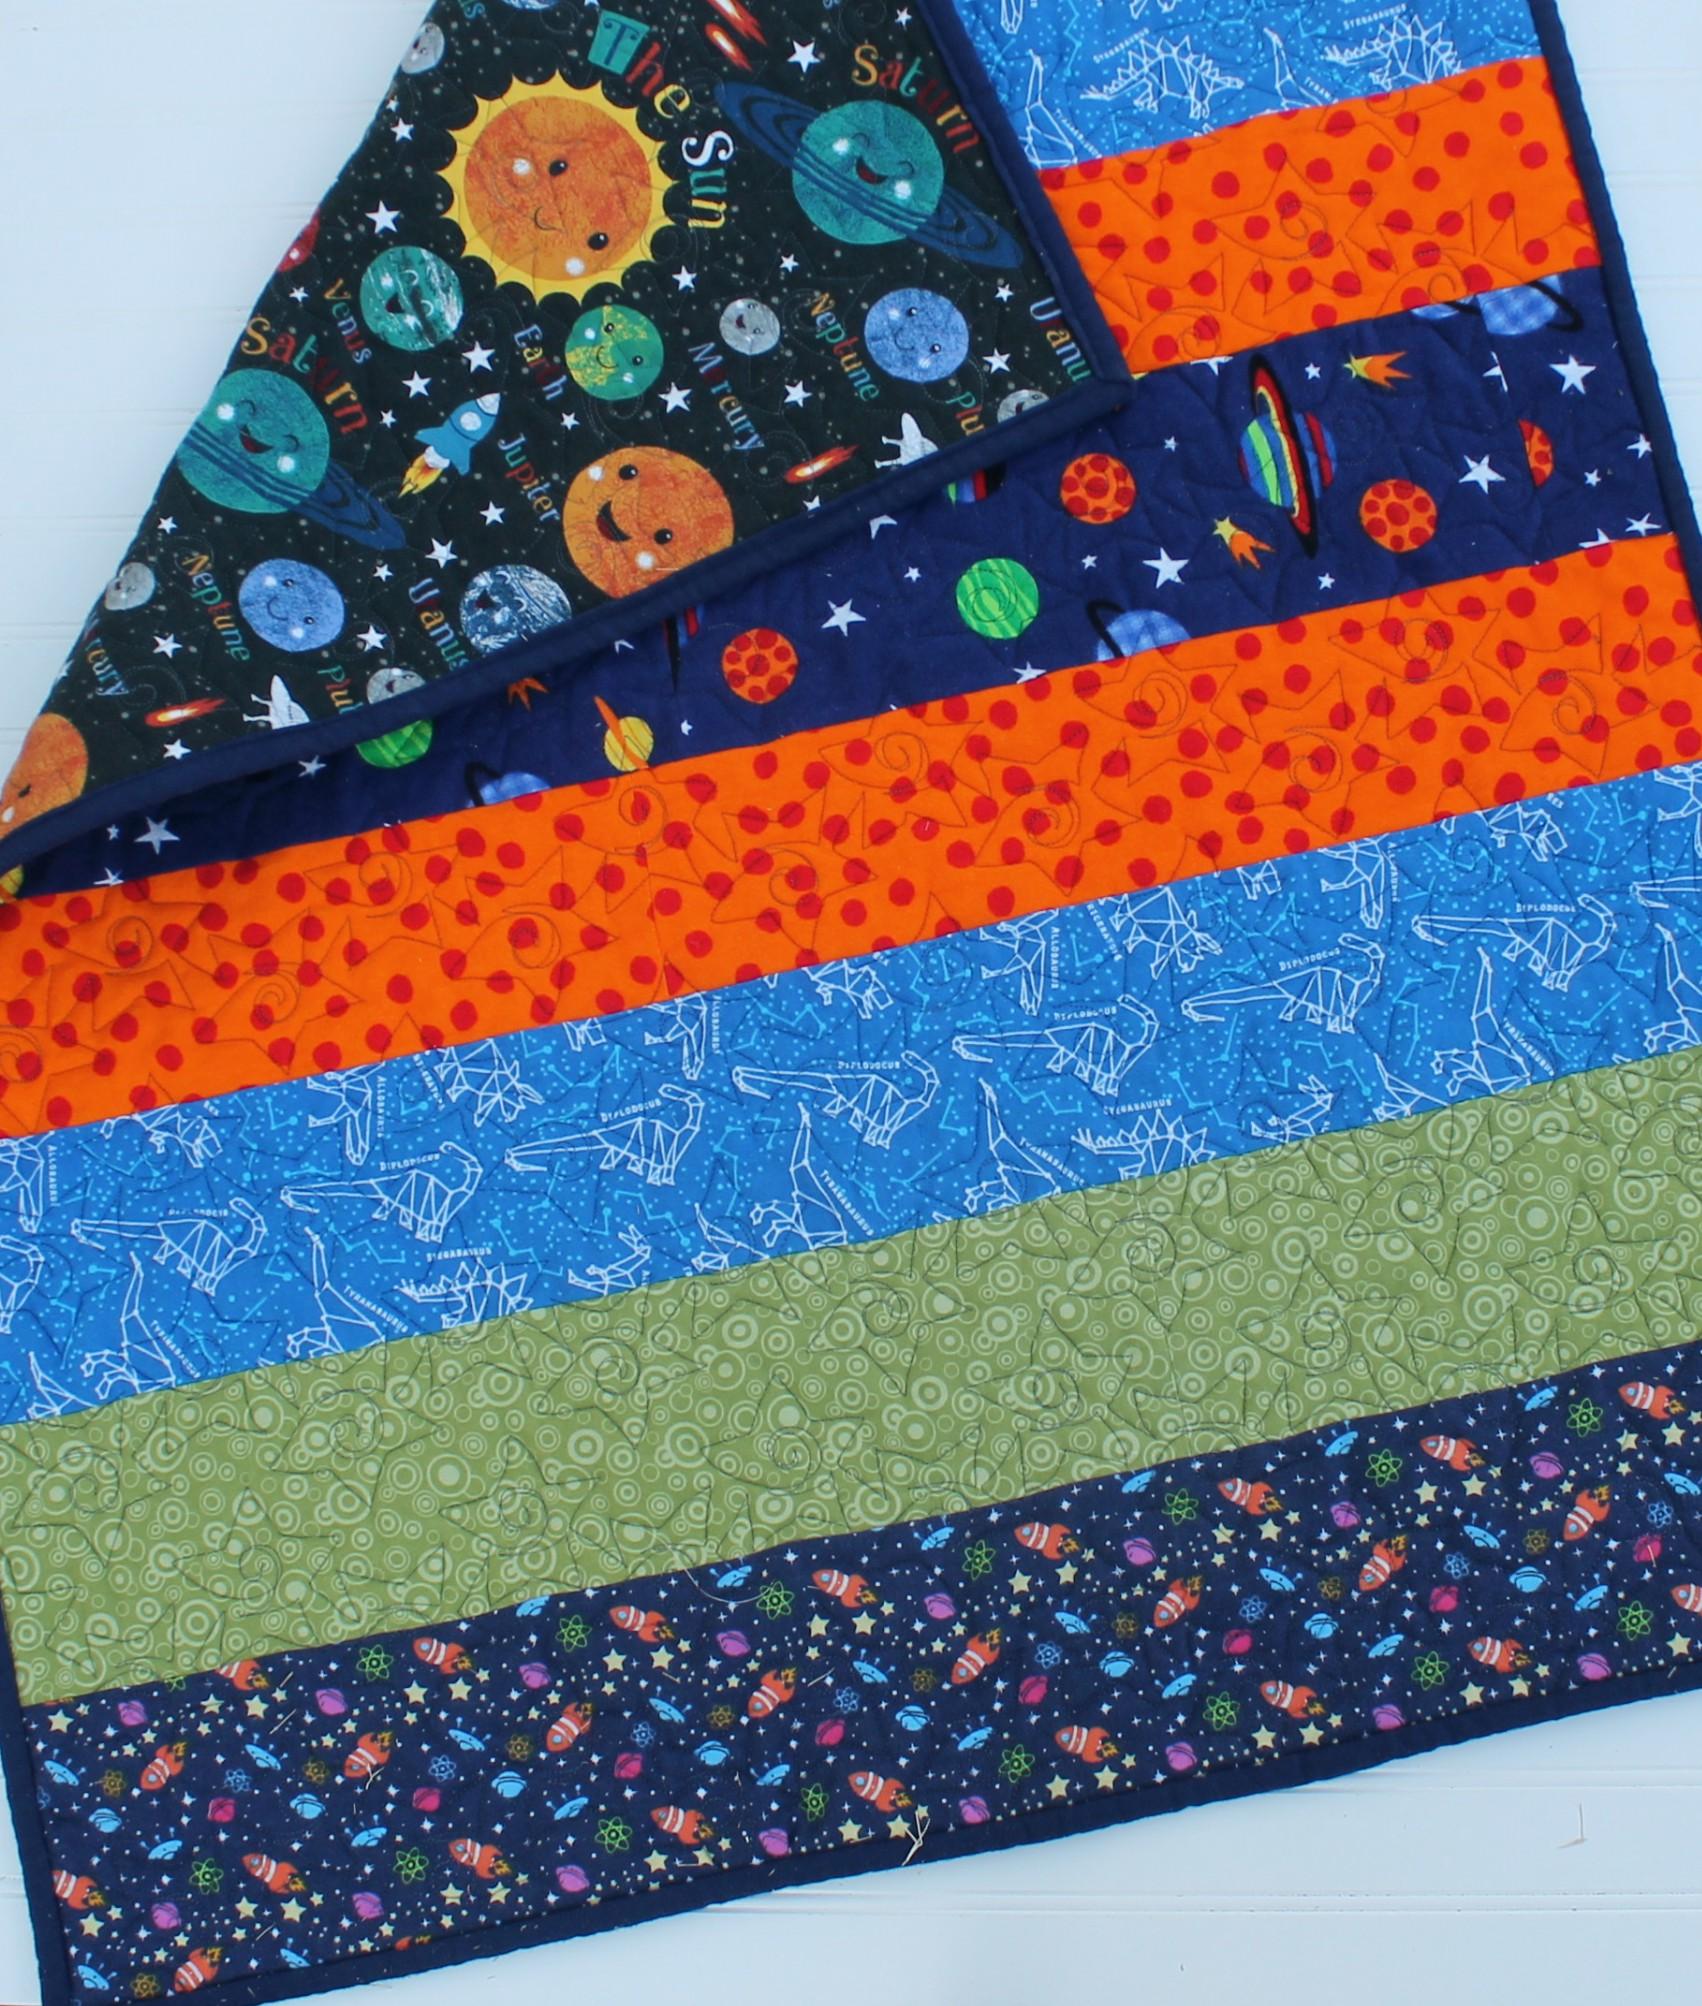 space_flannel_quilt5.jpg